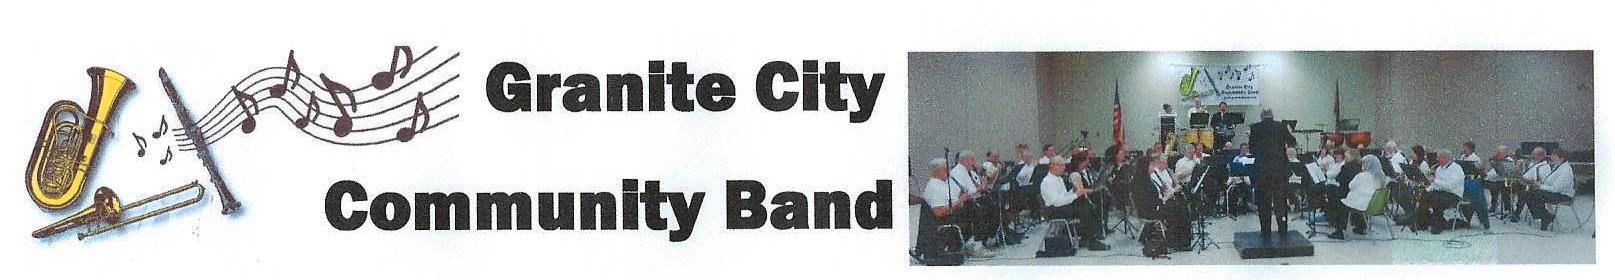 Granite City Community Band